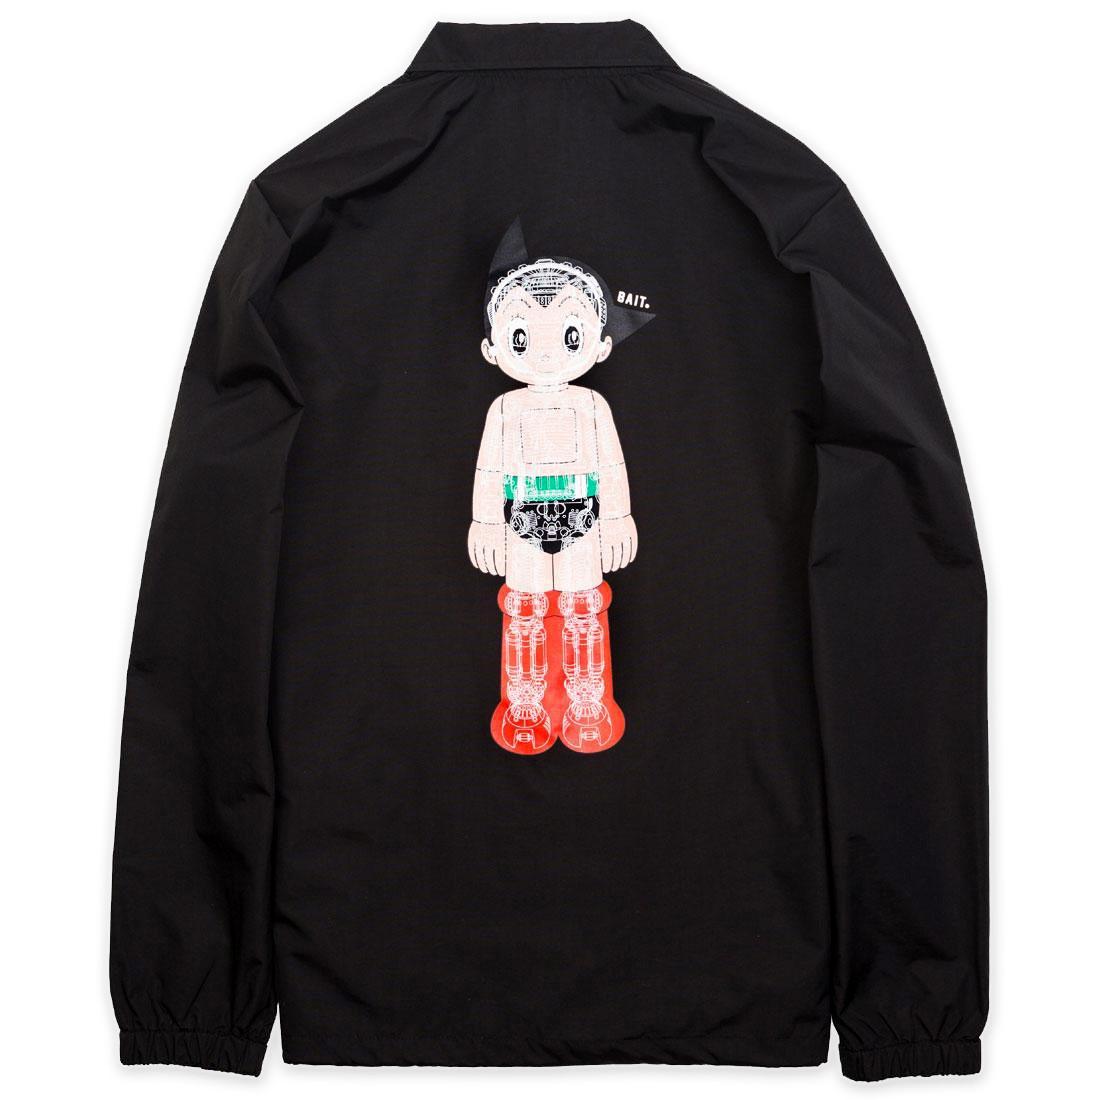 BAIT x Astro Boy Men Mechanics Coaches Jacket (black)